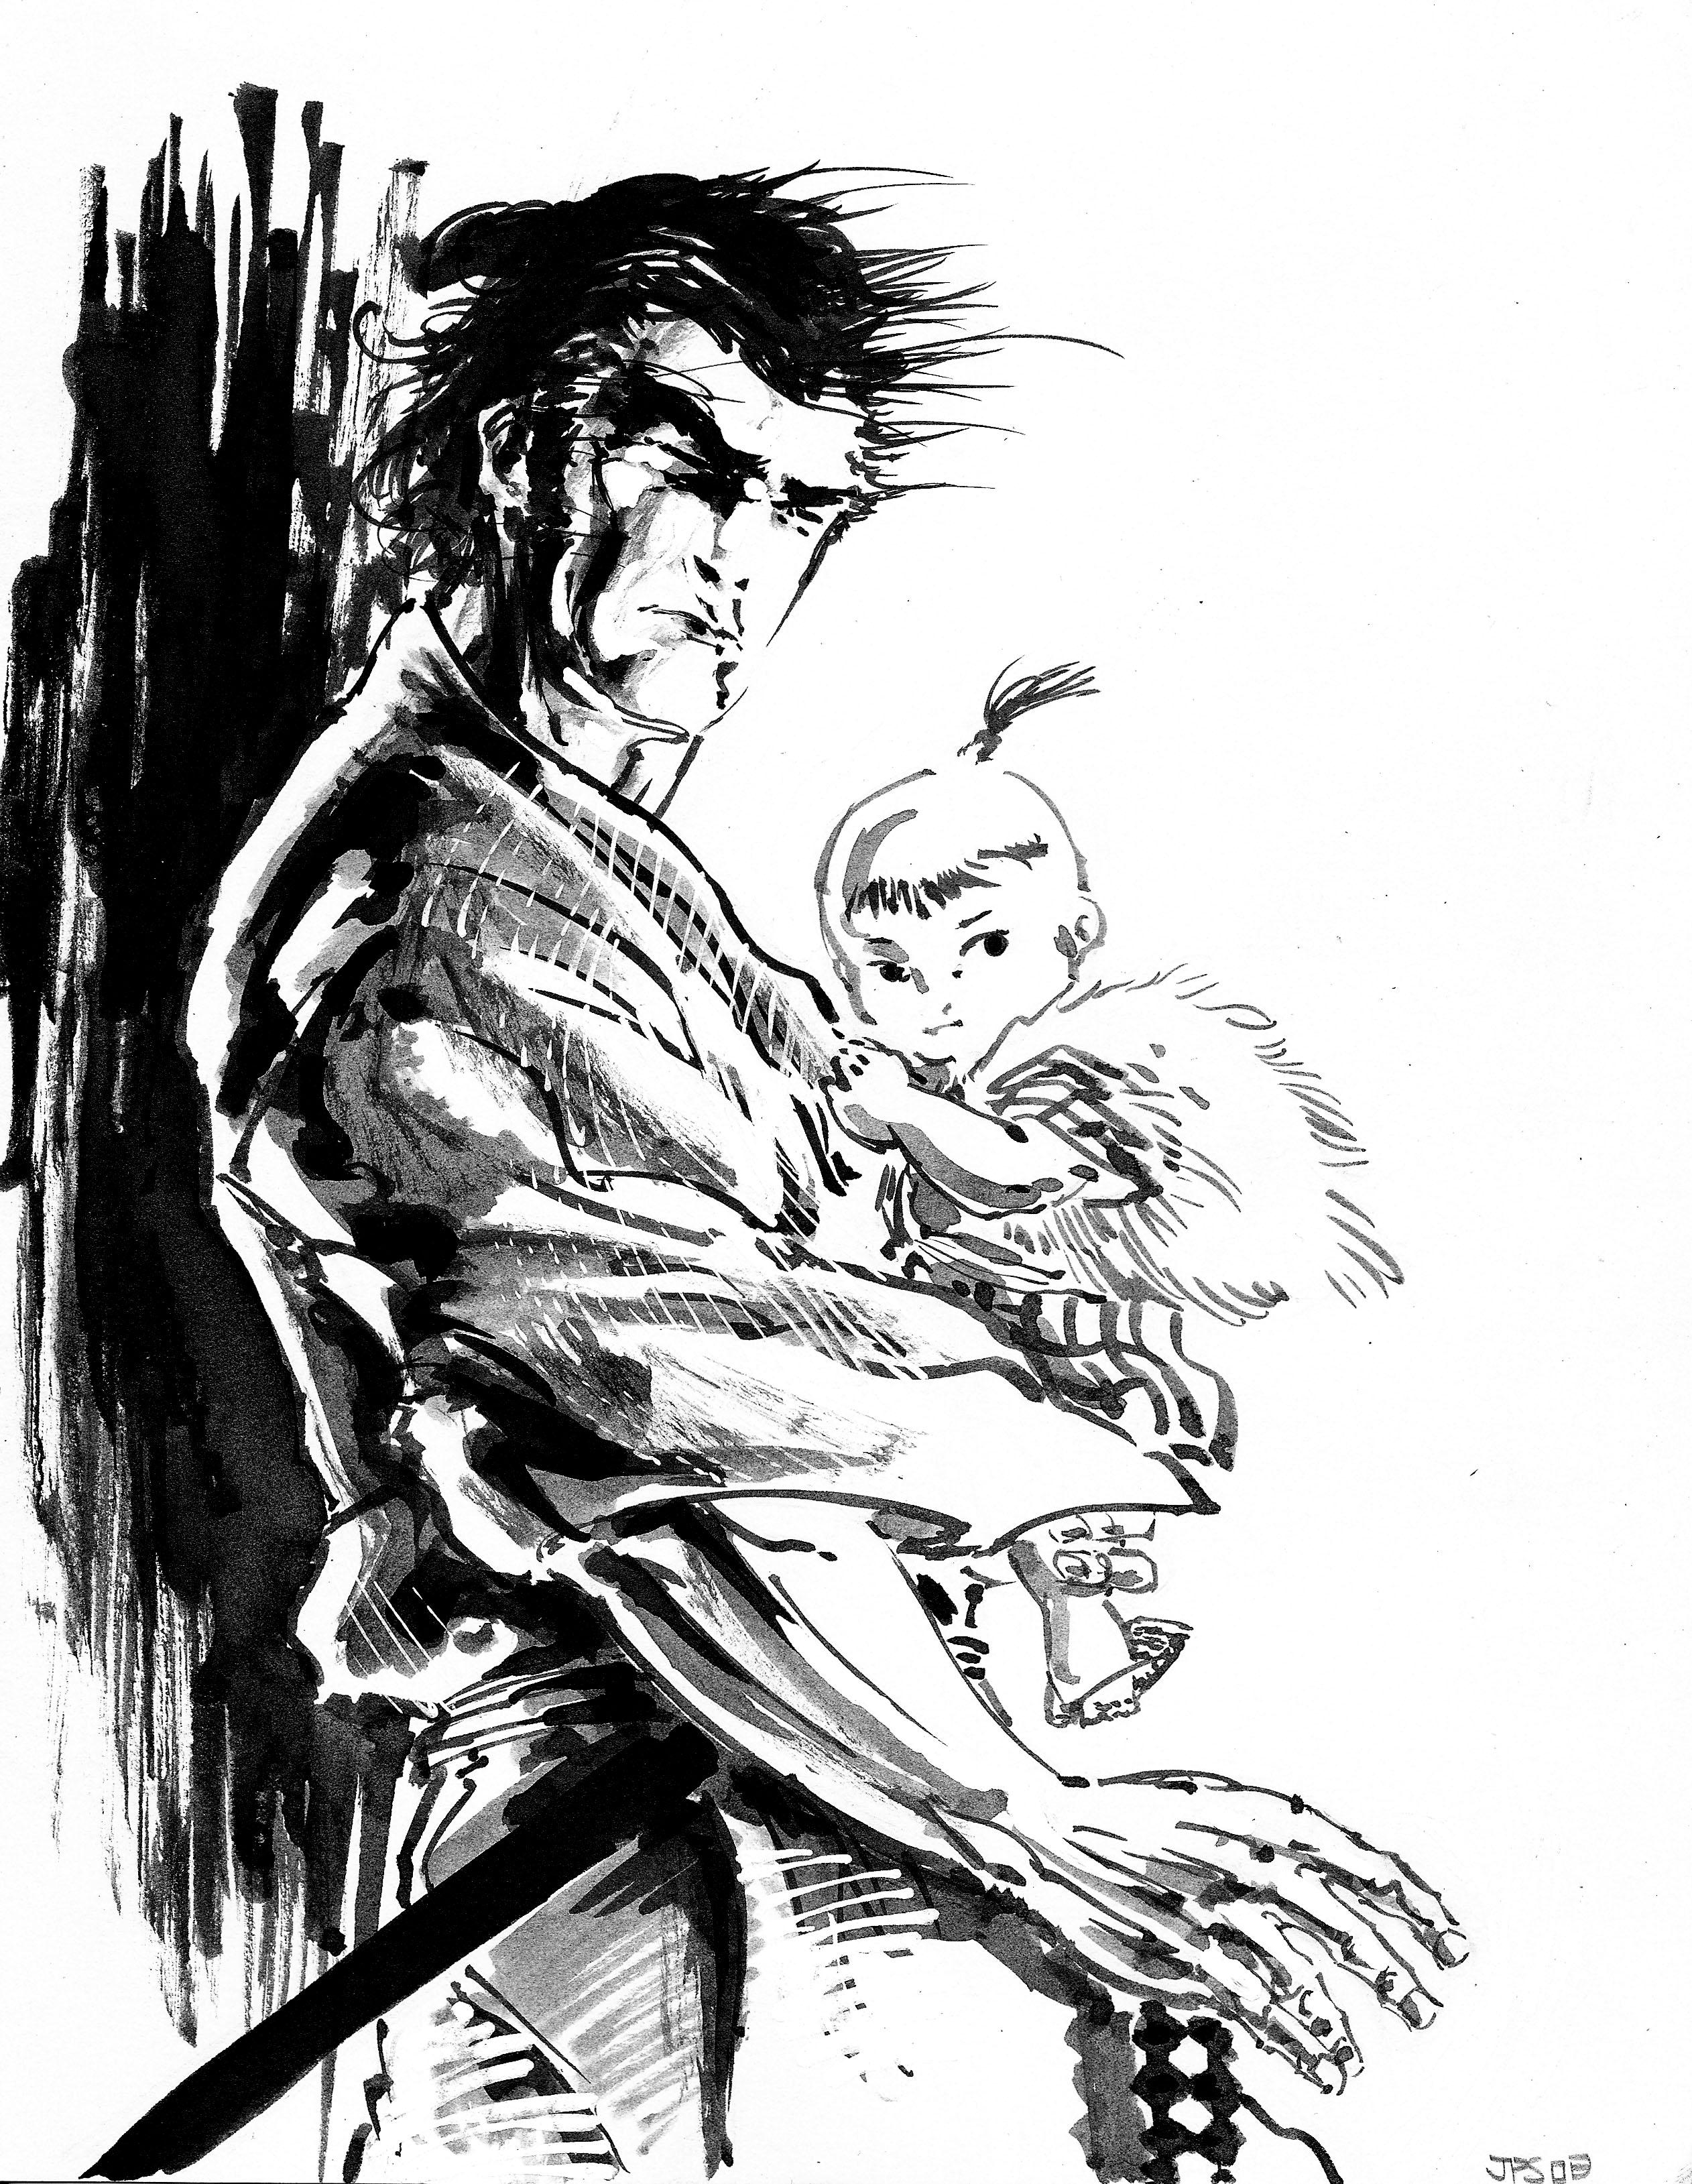 Drawn samurai old Son year the Ogami Wolf